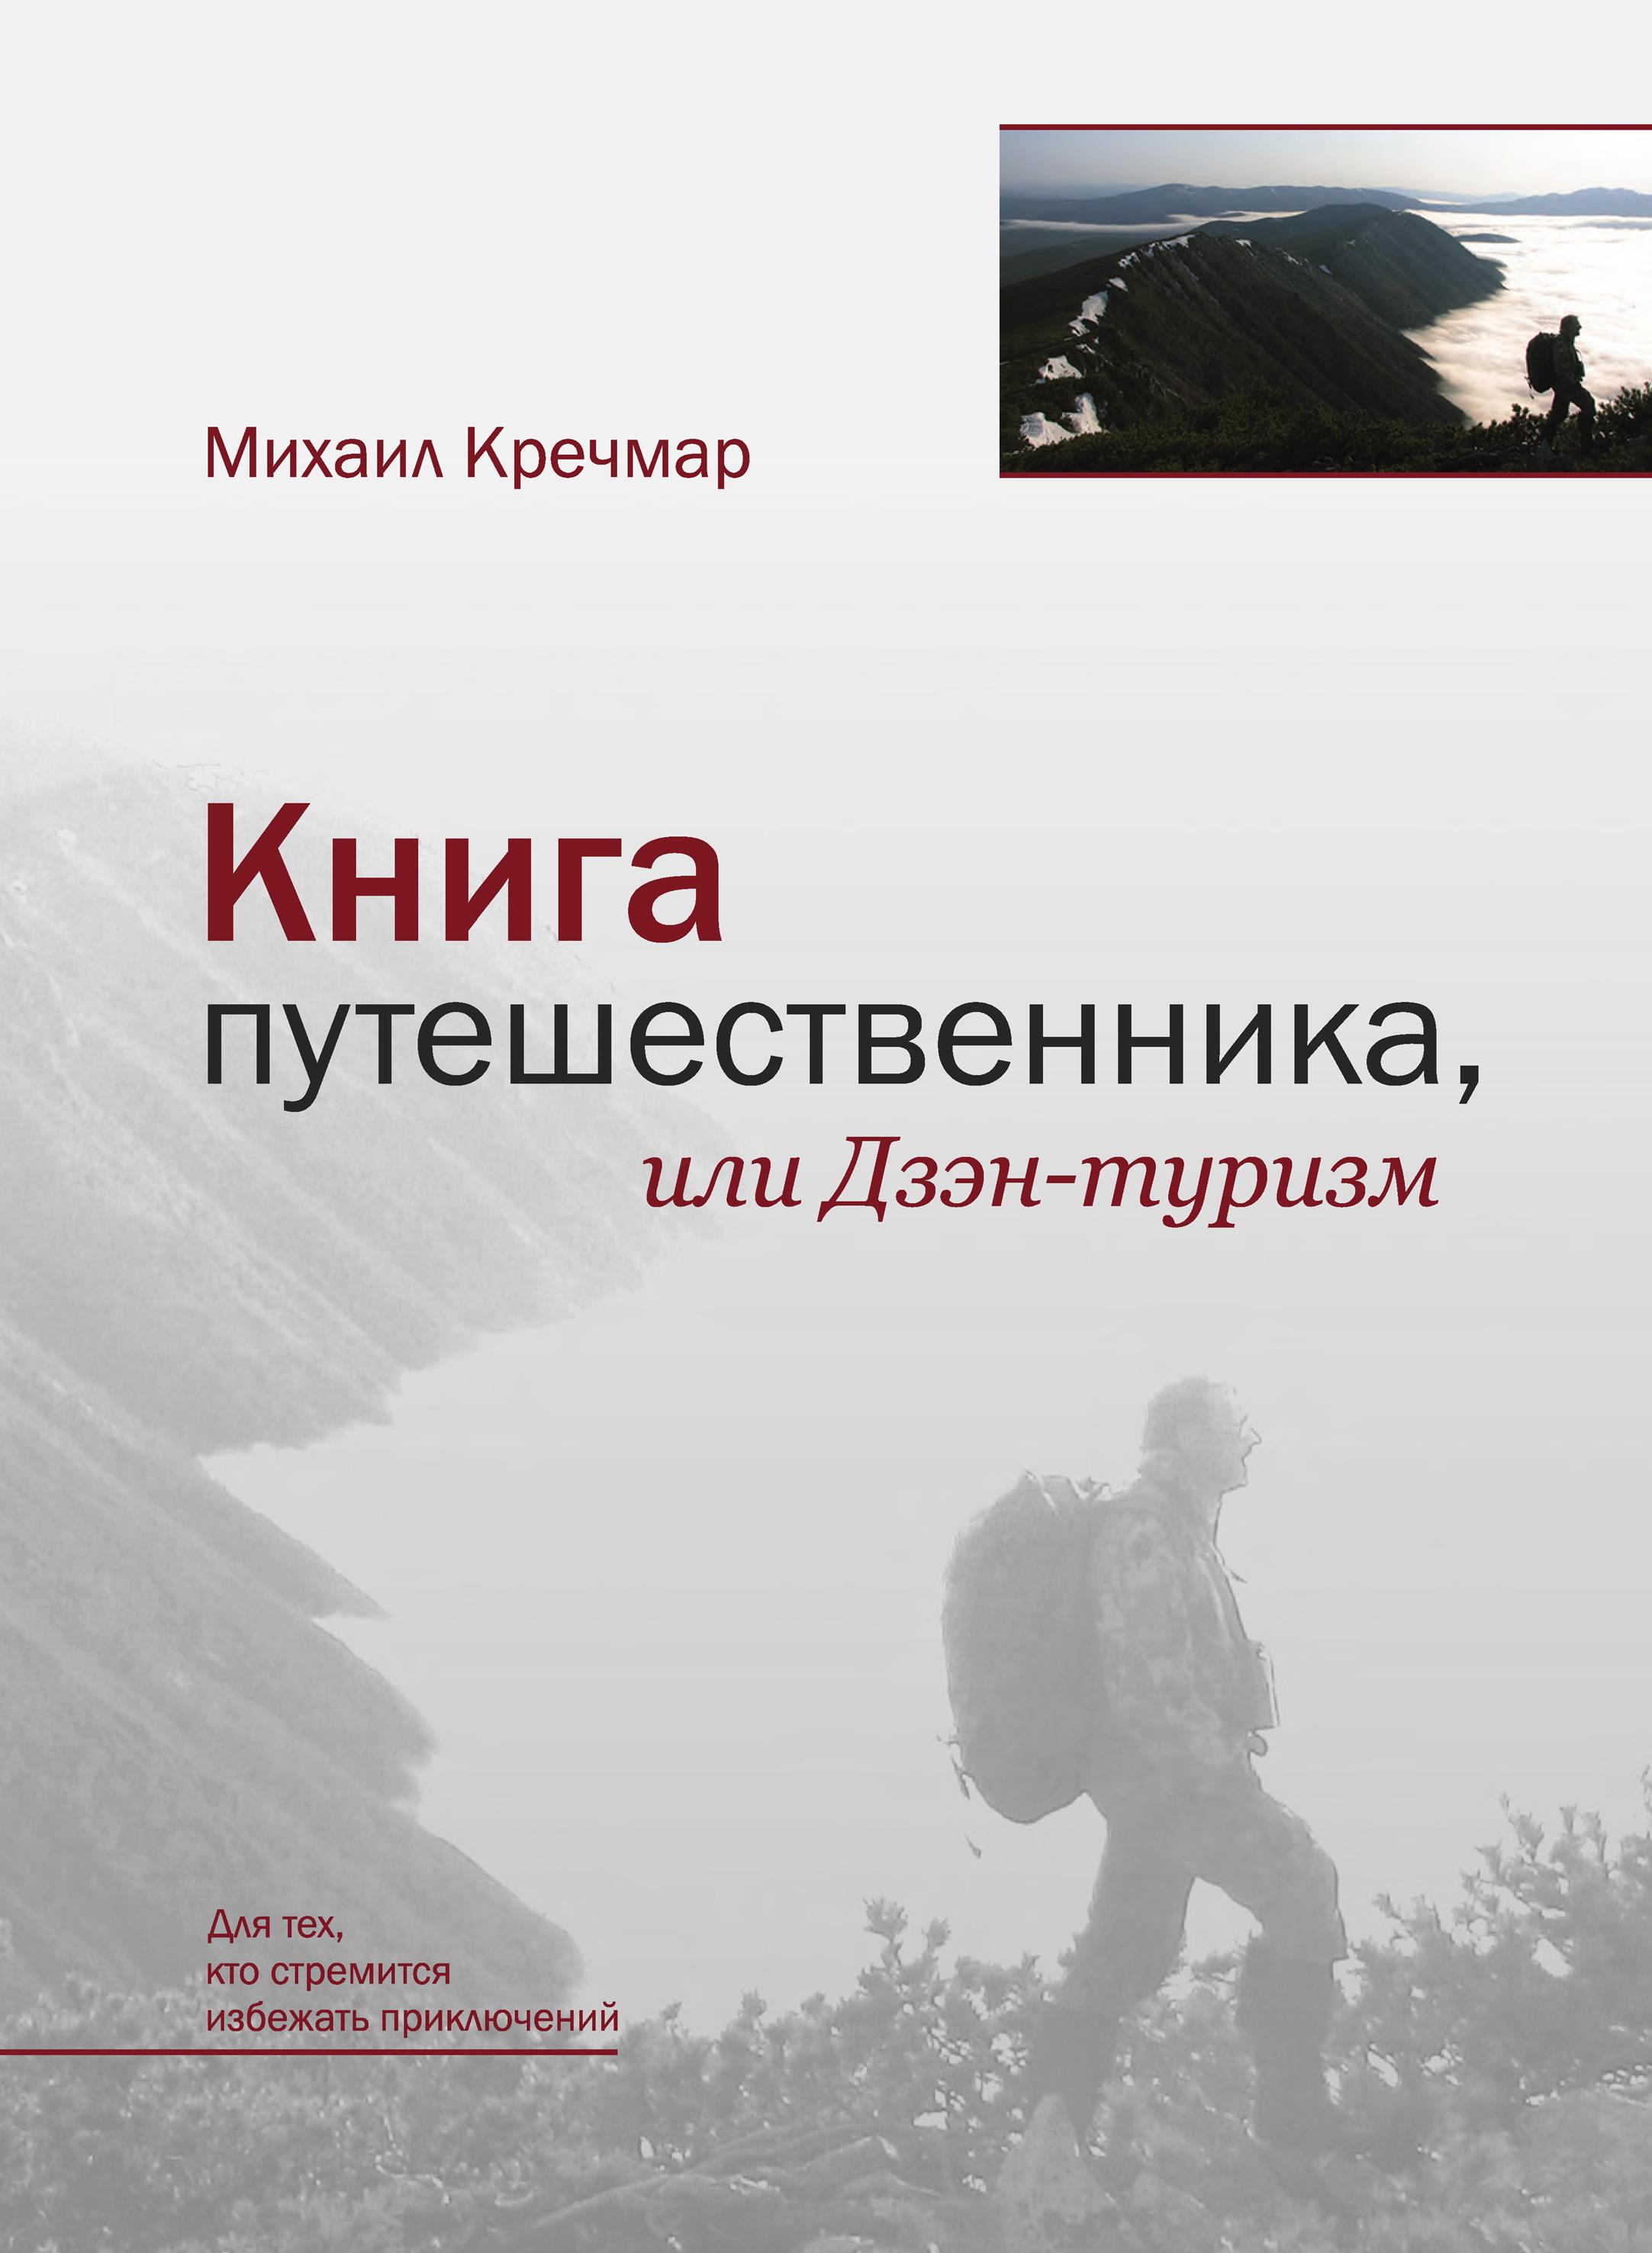 Михаил Кречмар «Книга путешественника, или Дзэн-туризм»